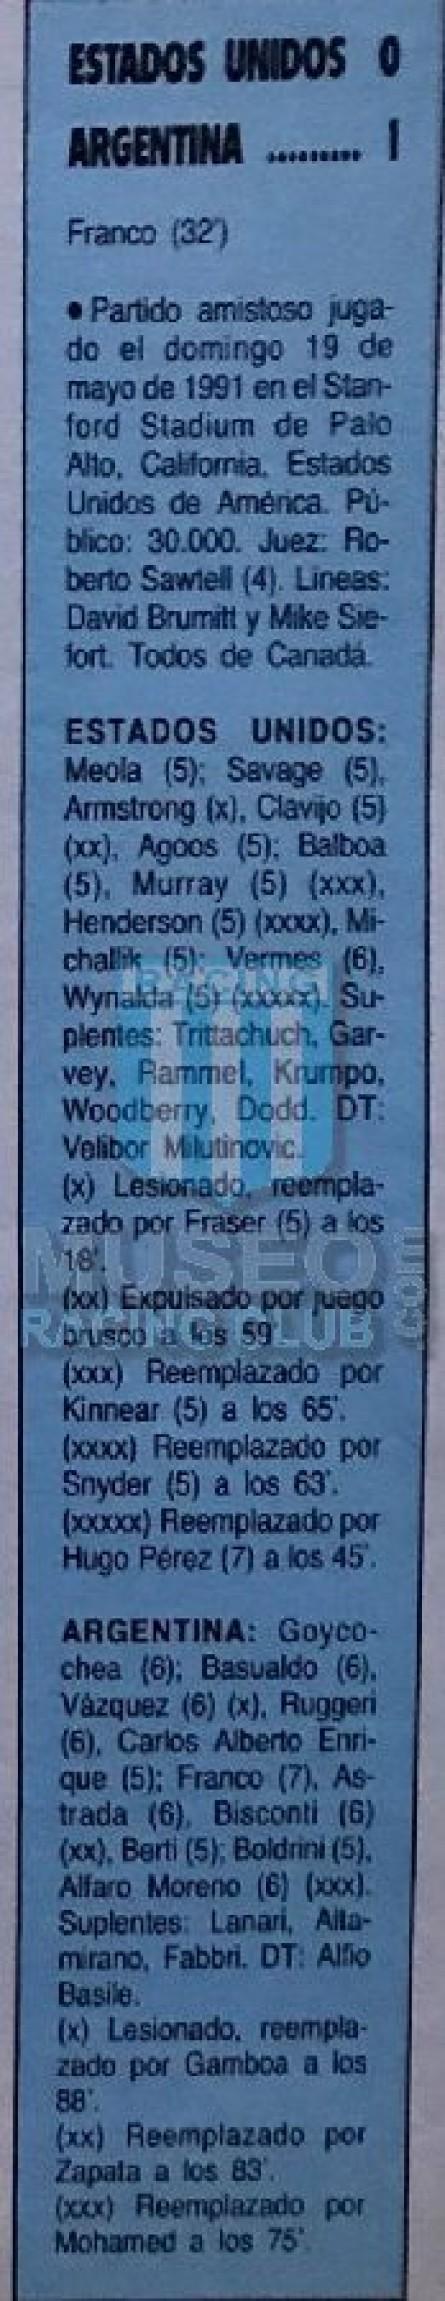 Argentina_1991_Away_Adidas_FriendlyvsUSA_FICHA_MC_19_AntonioMohamed_jugador_01